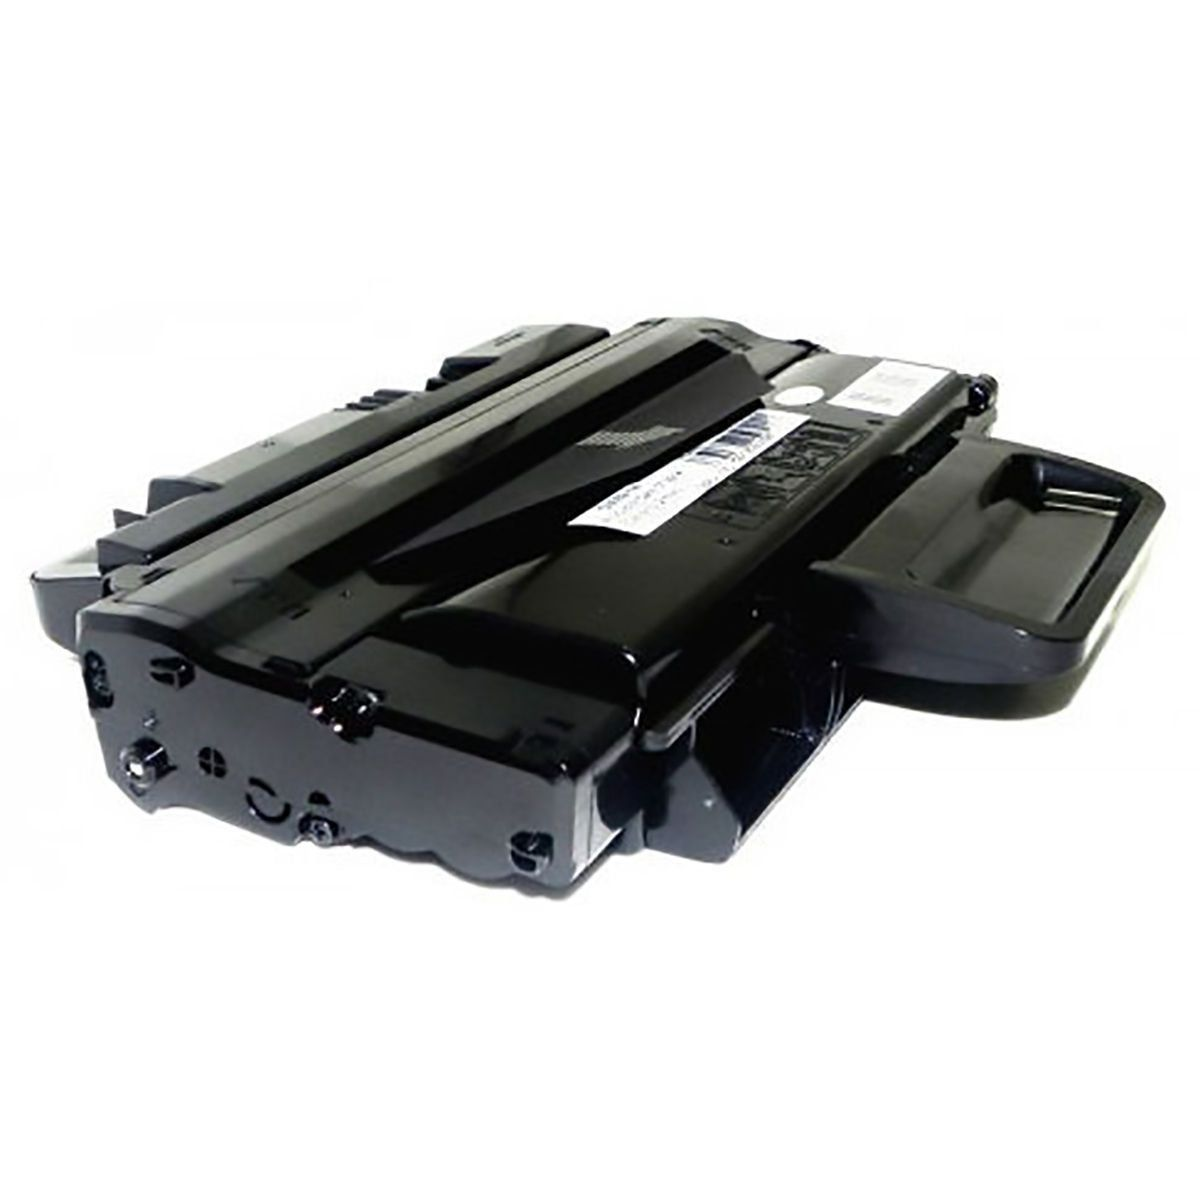 Compatível: Toner D2850B para Samsung ML-2850 ML-2851 2850d 2851d 2851nd 2851ndl ML2850 ML2851 / Preto / 5.000